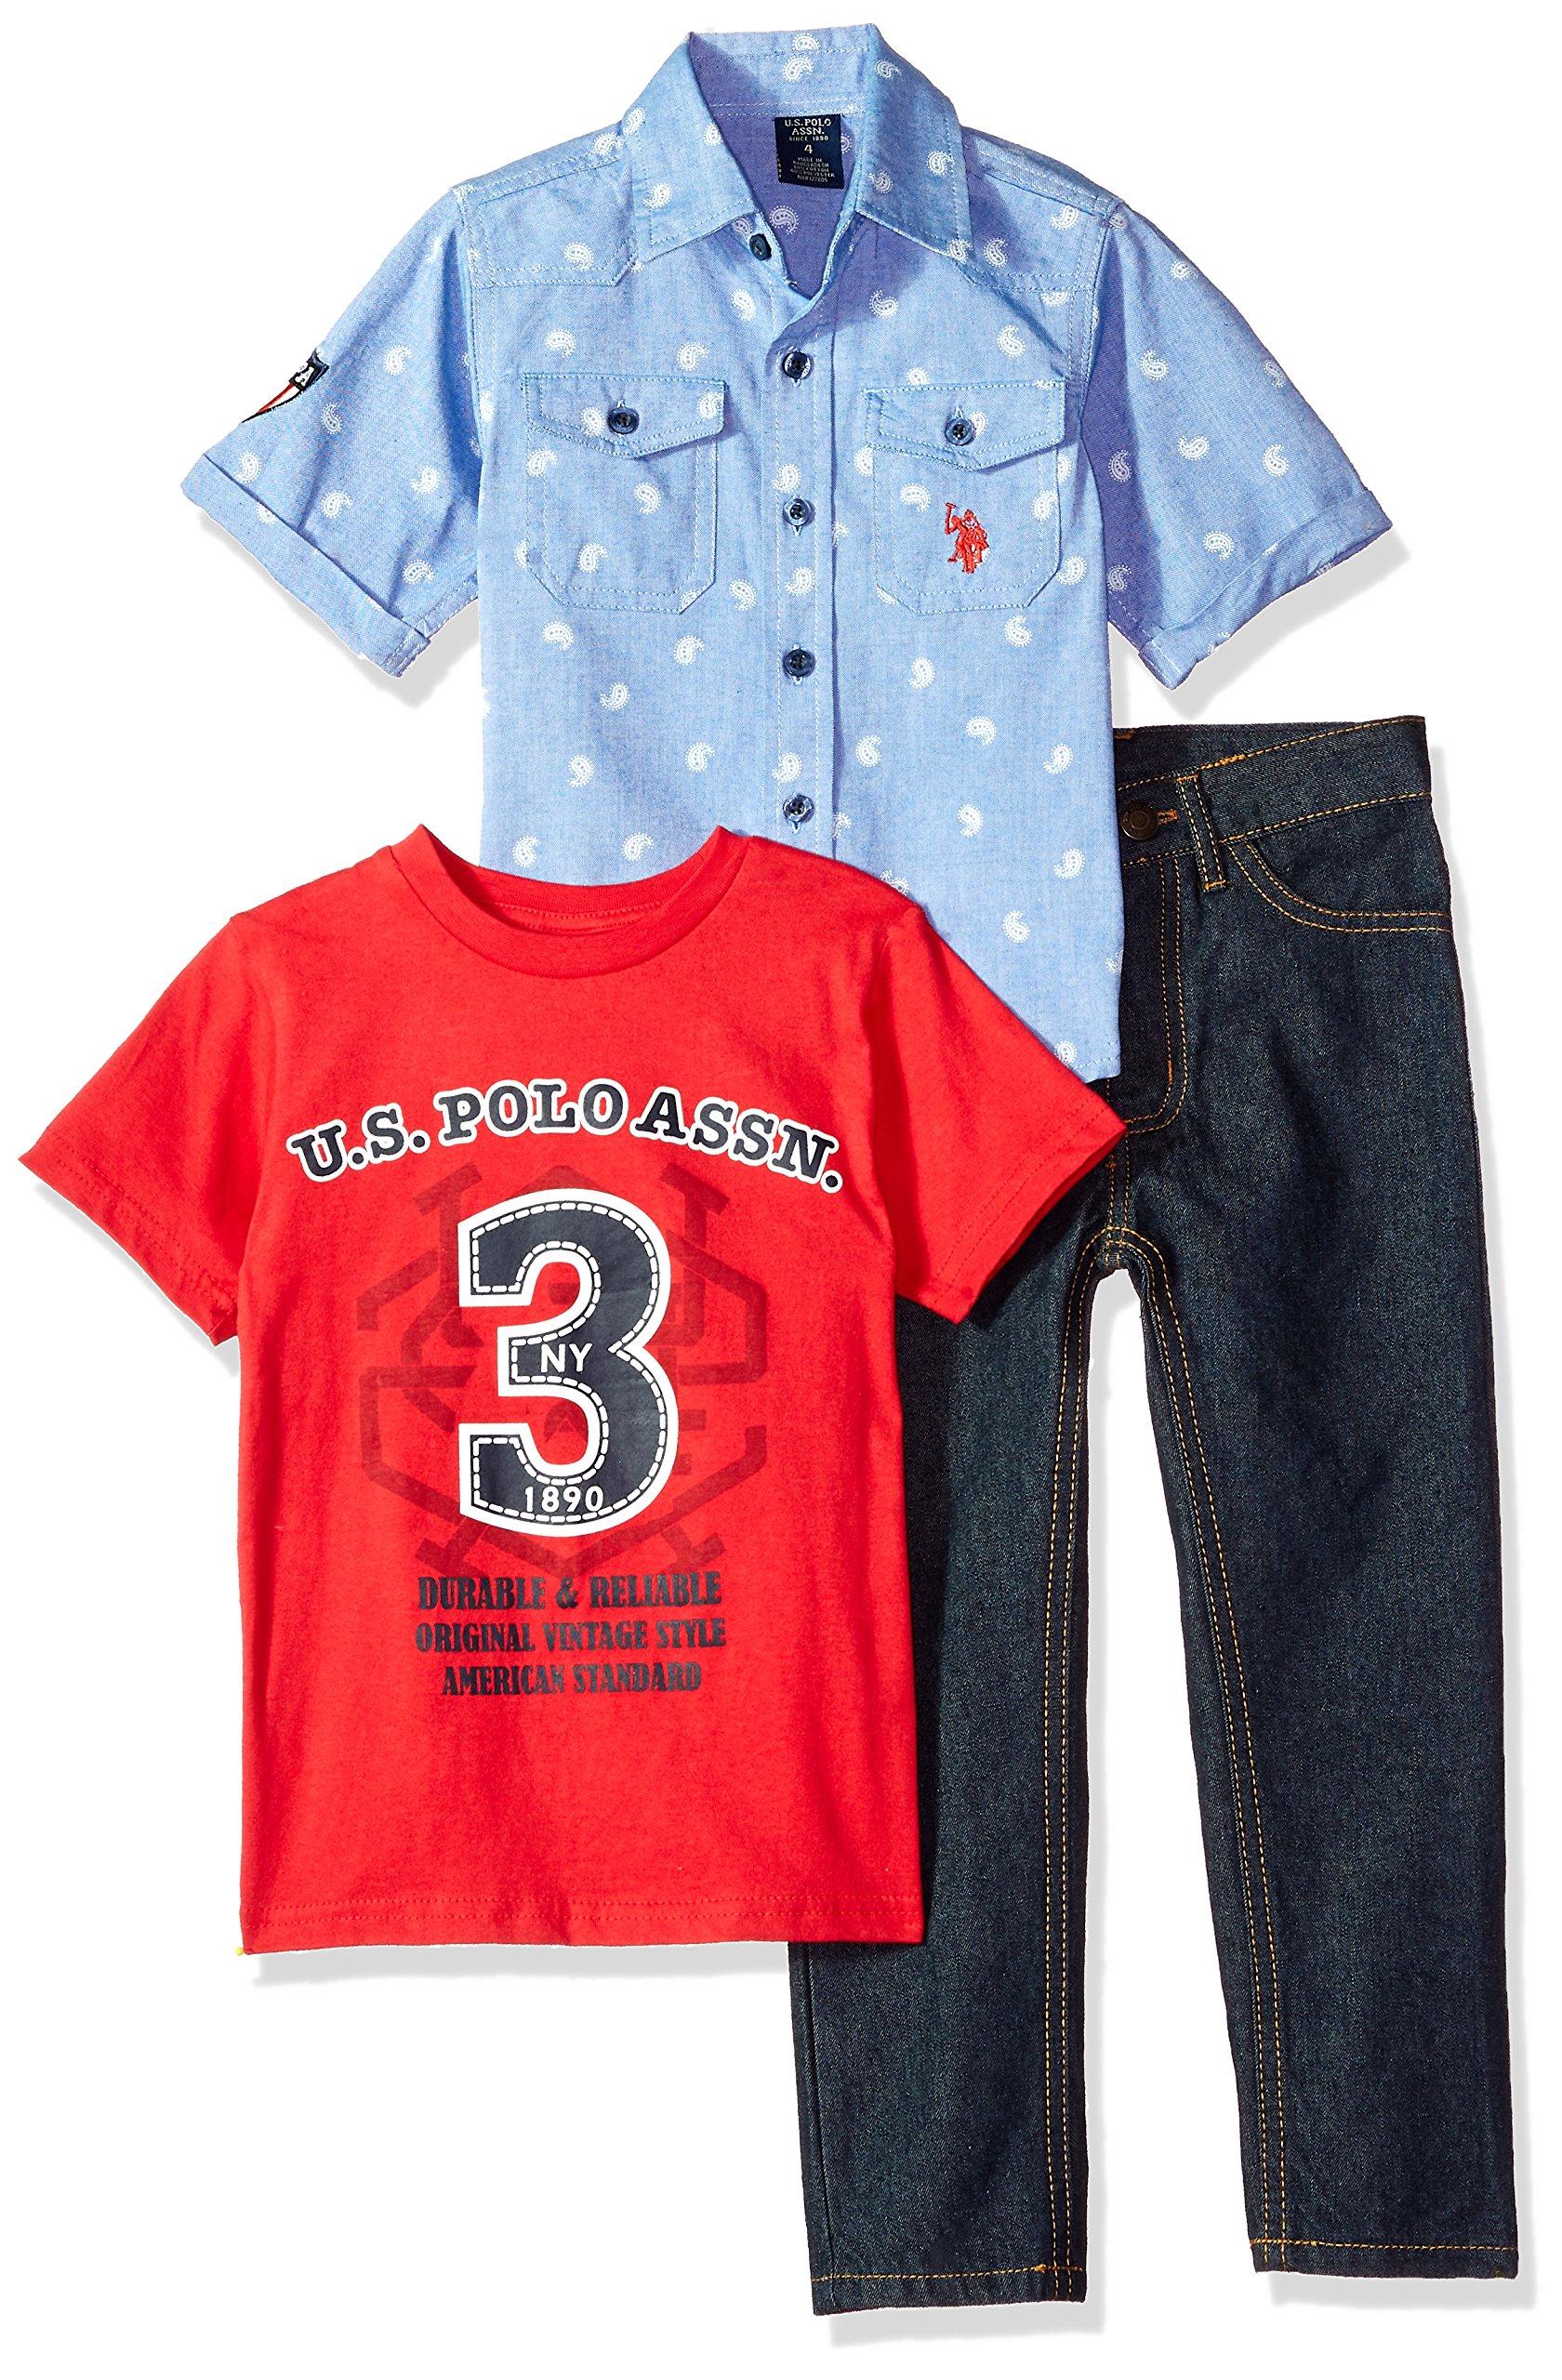 U.S. Polo Assn. Boys' Little Short Sleeve, T-Shirt and Pant Set, Durable Reliable Vintage Style Multi Plaid, 7